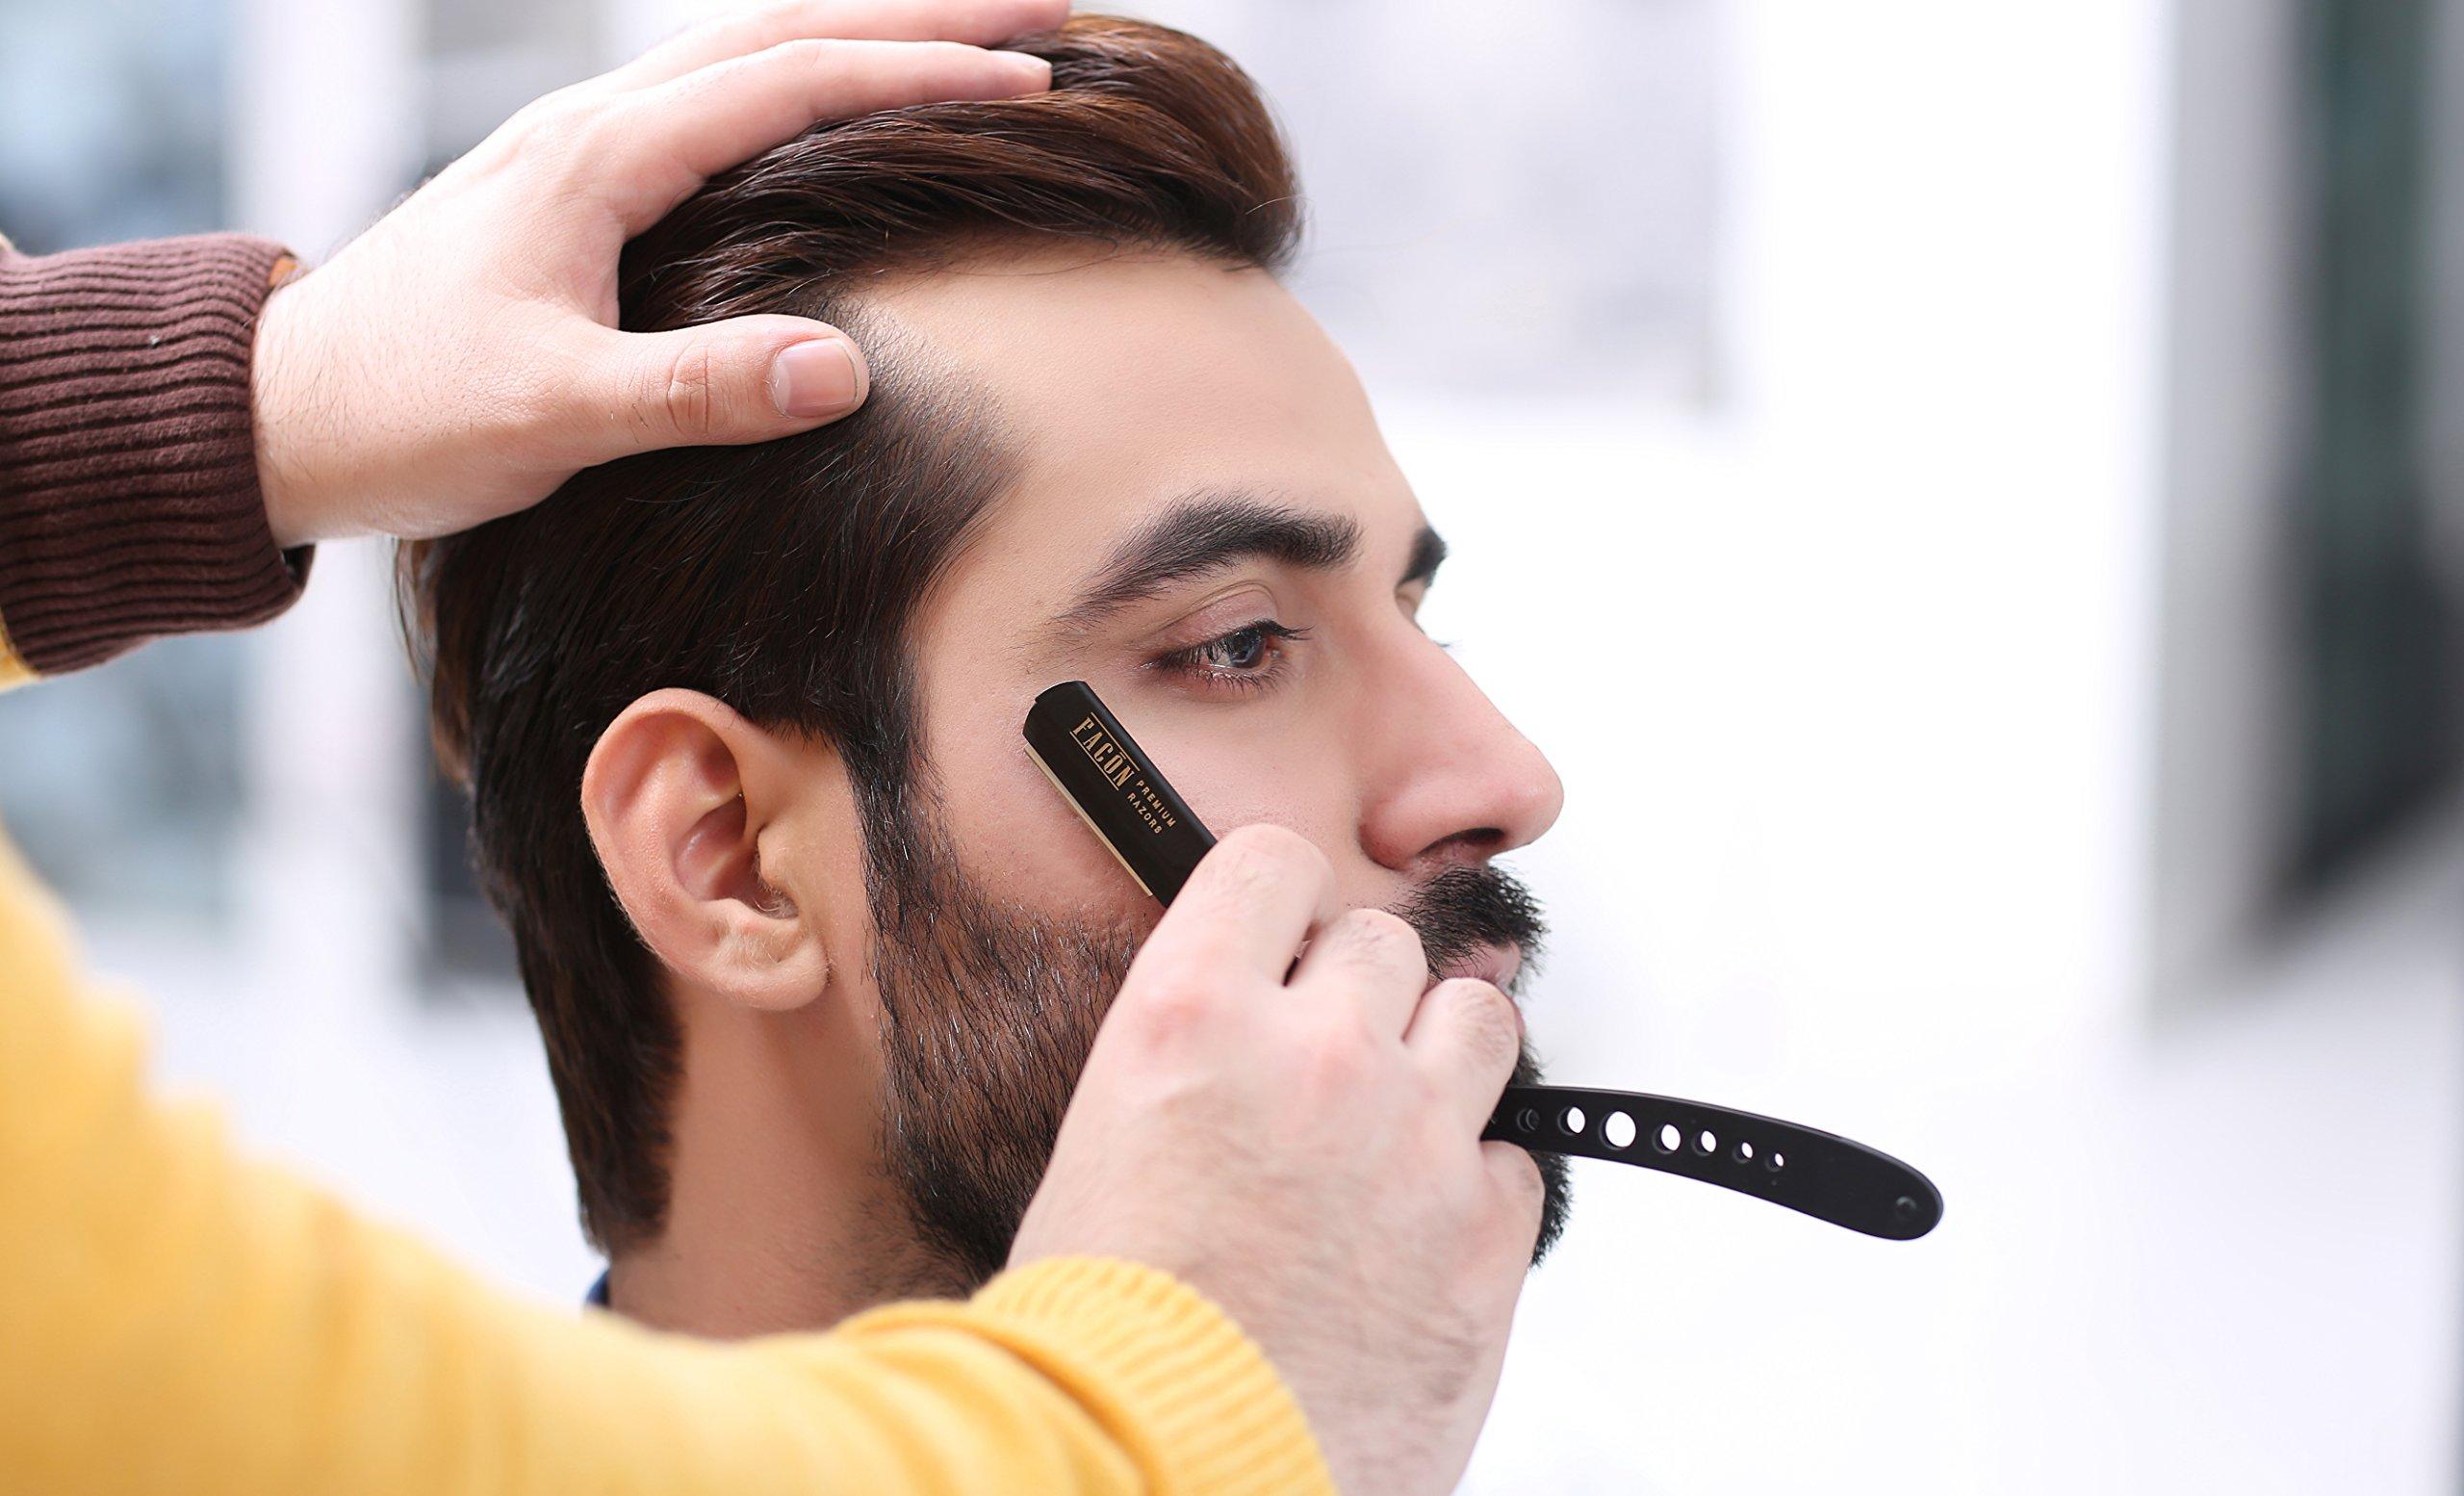 100 BLADES + Facón Professional Classic Straight Edge Barber Razor - Salon Quality Cut Throat Shavette by Facón Razors (Image #5)